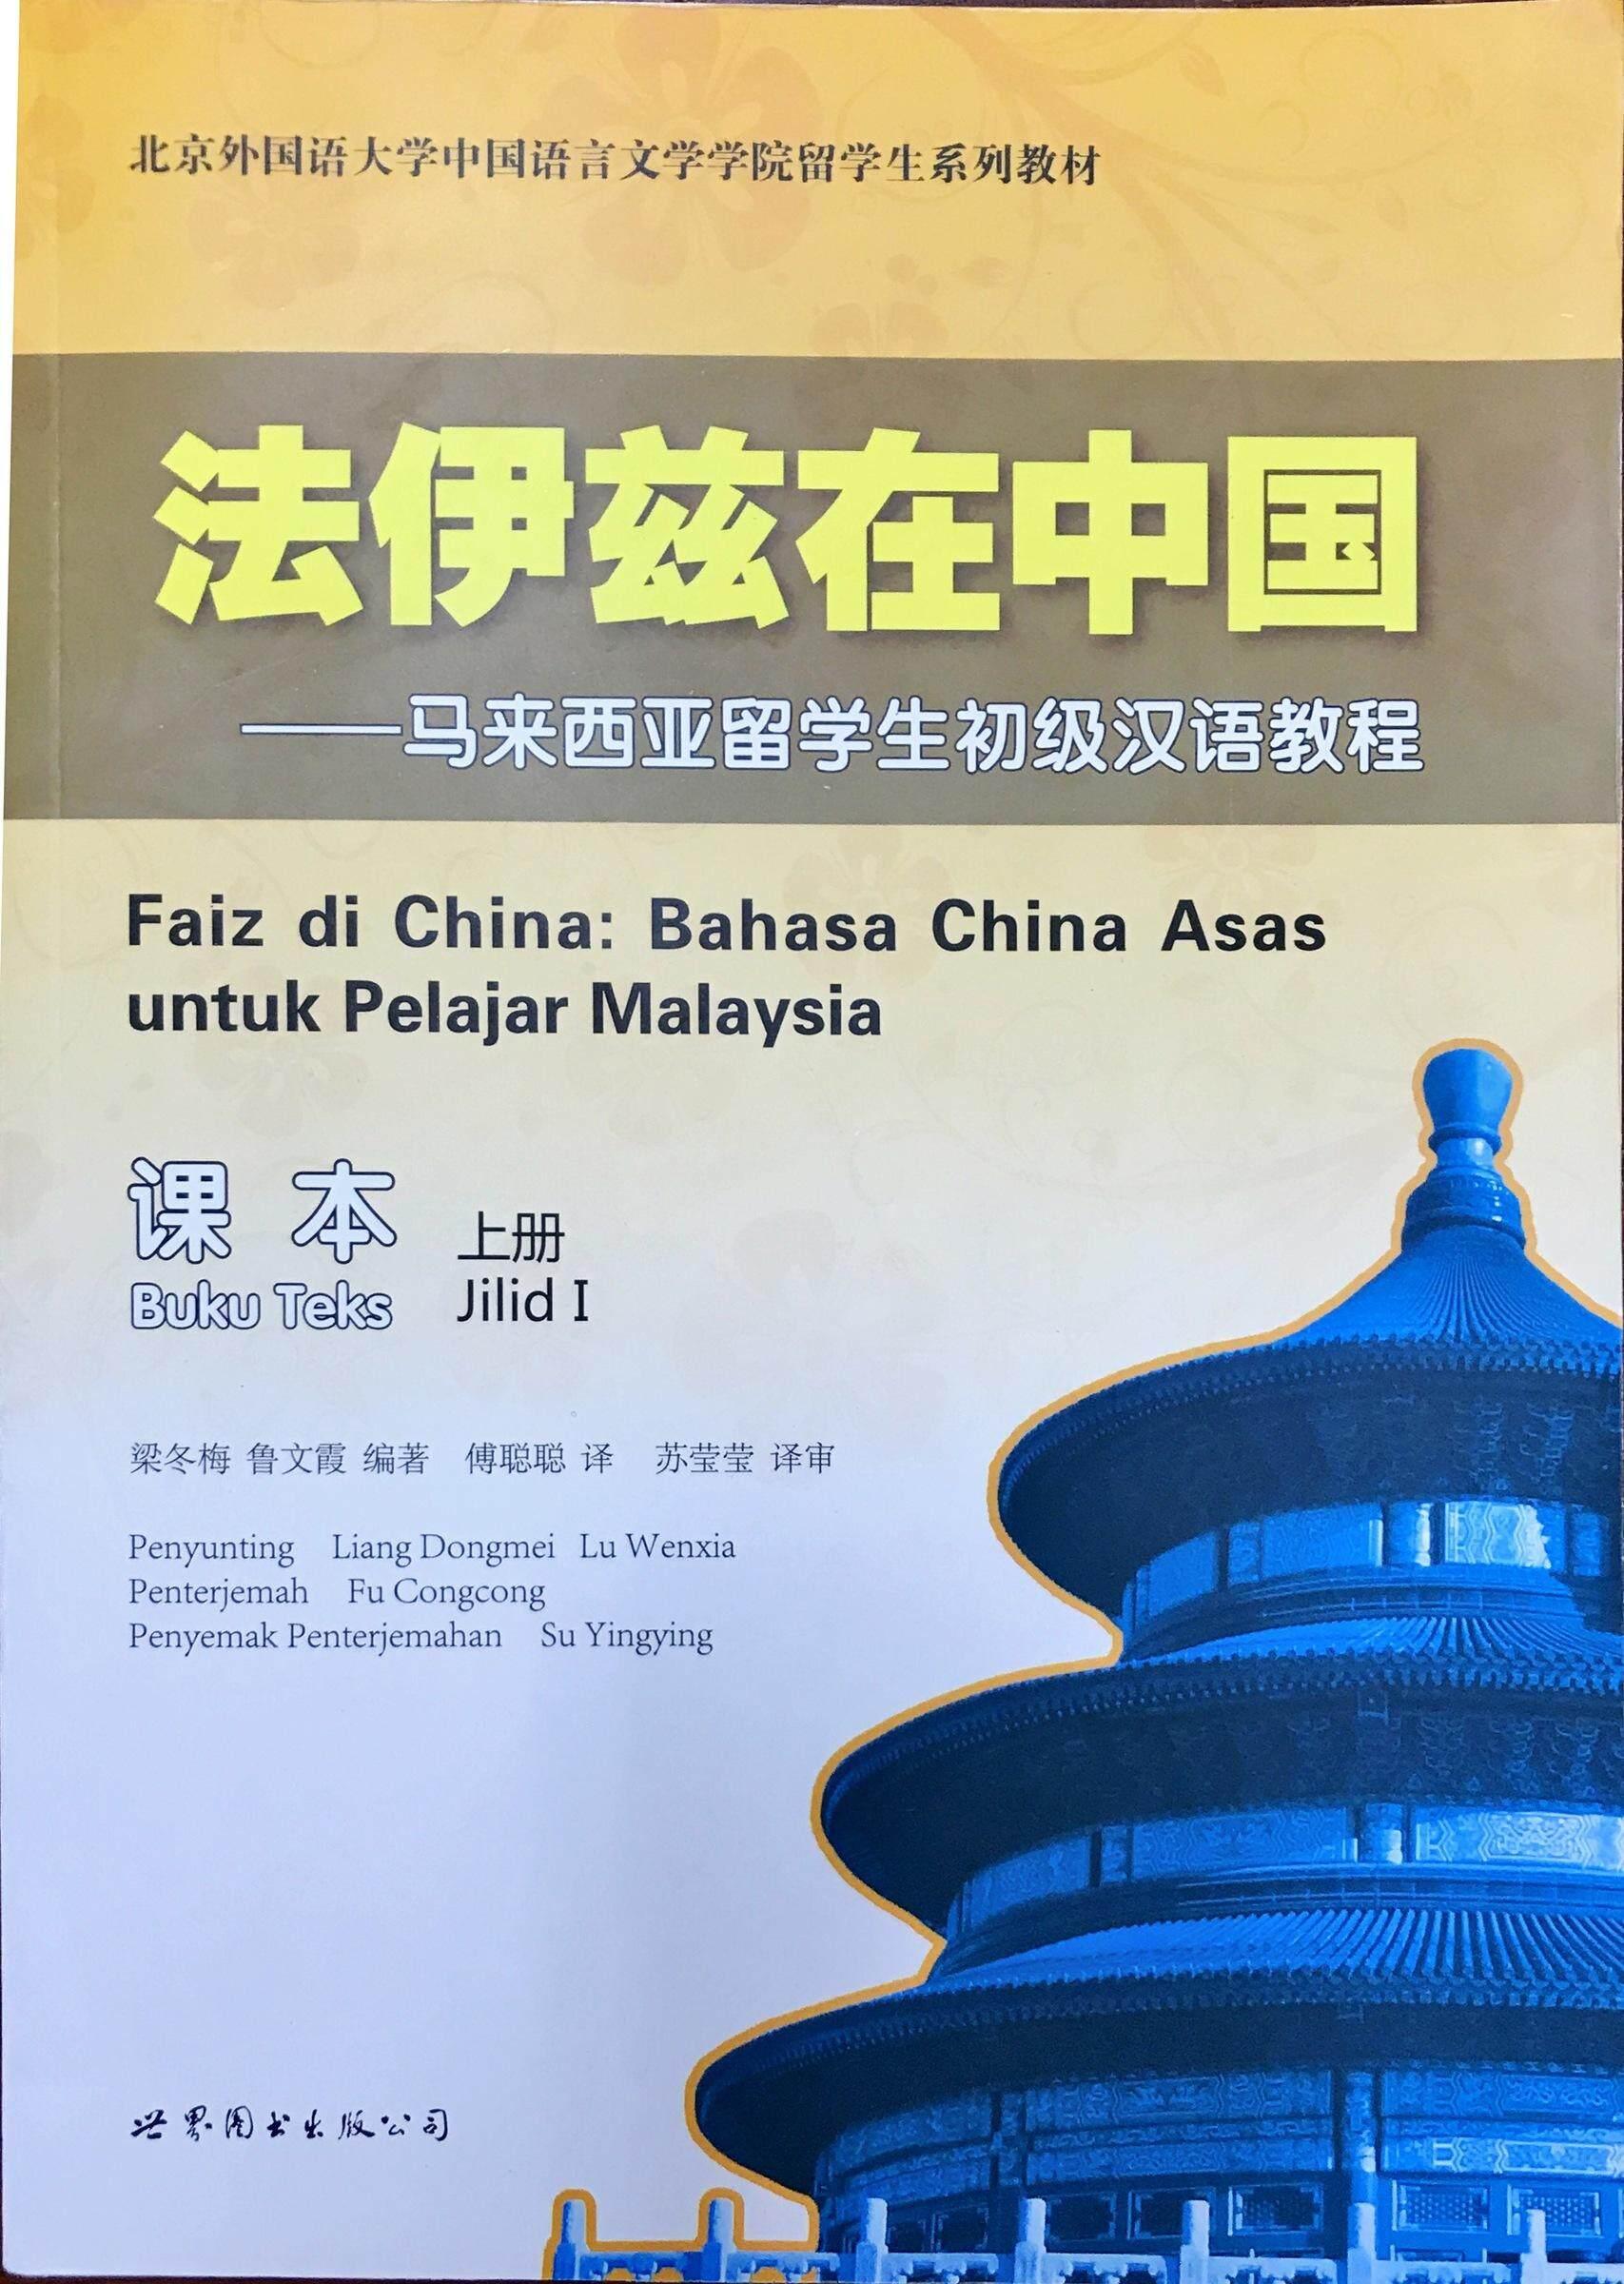 Chinese Book for Malay to Learn Mandarin: Faiz di China: Bahasa China Asas untuk Pelajar Malaysia Jilid 1